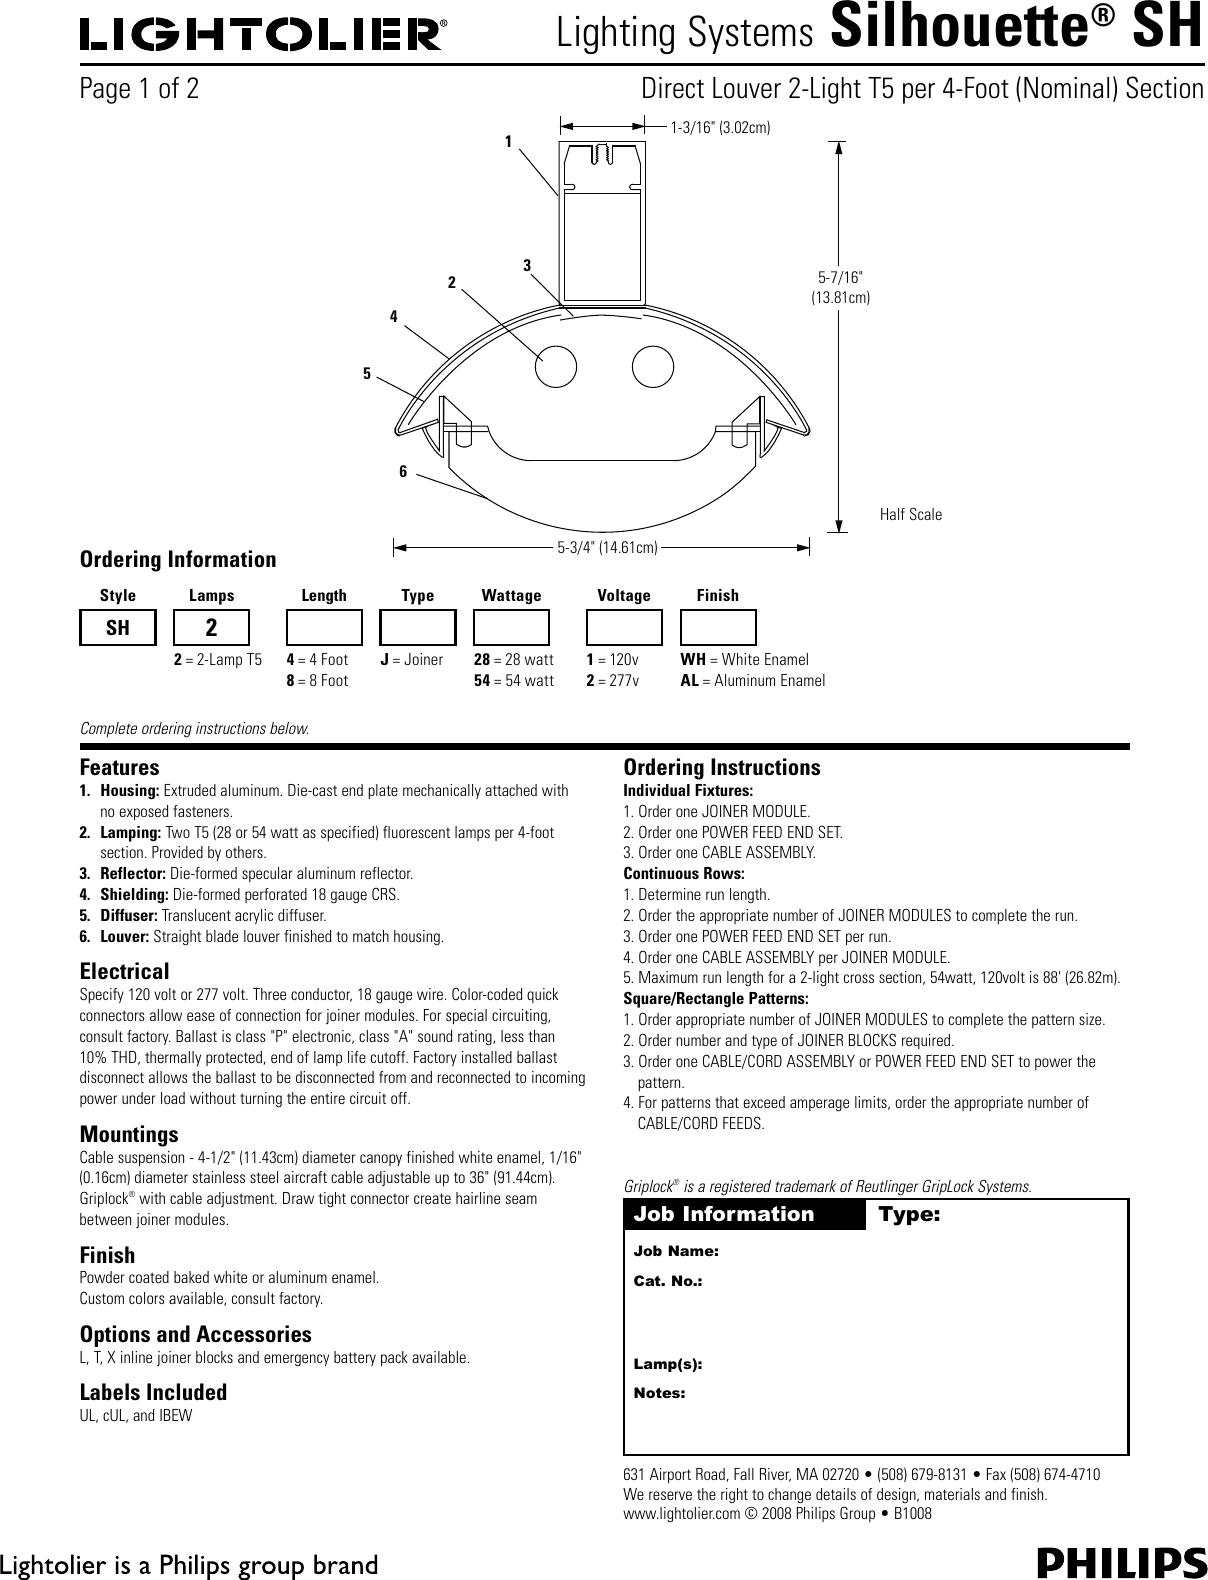 Lightolier Silhouette Sh Users Manual Al1t5 T5 Ballast Wiring Diagram 120 277